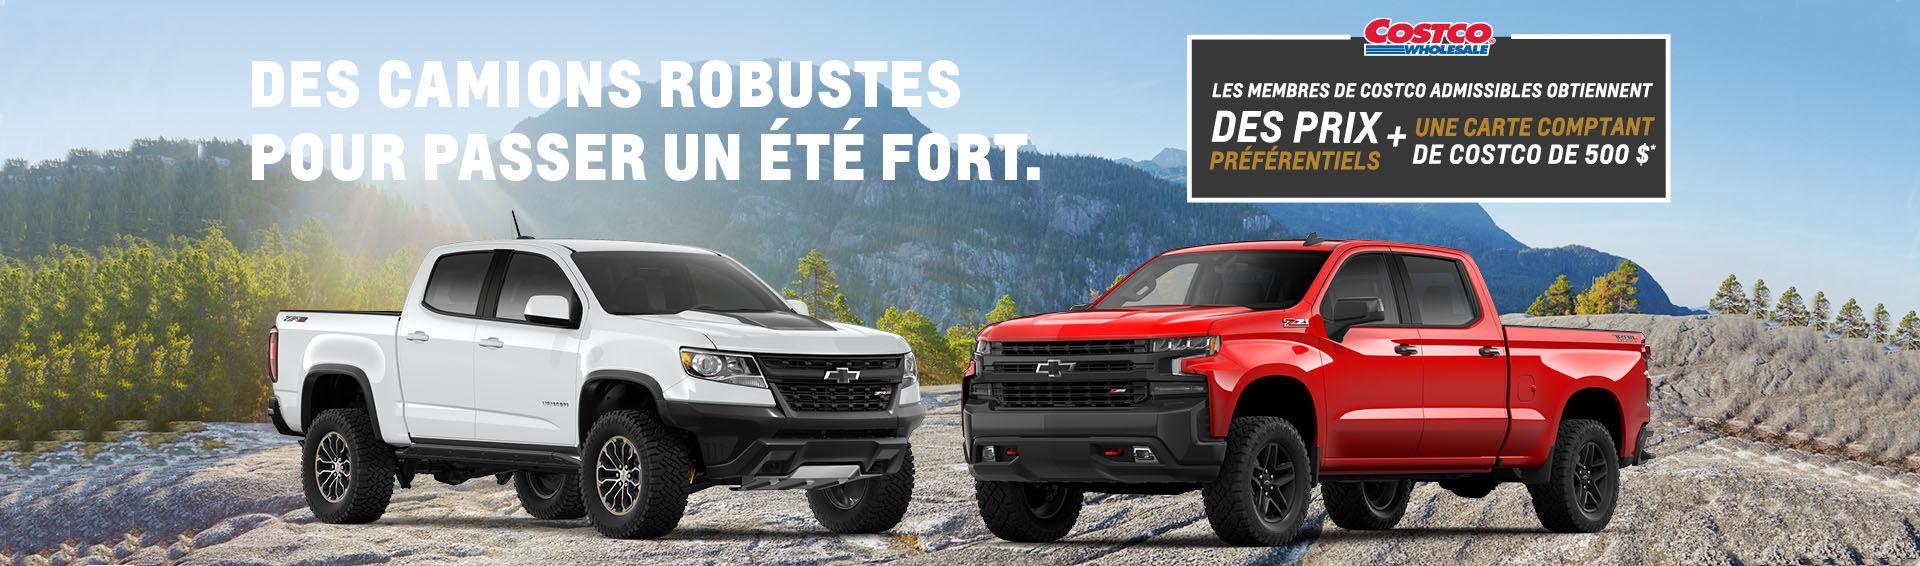 Promotion Chevrolet Truck Juillet